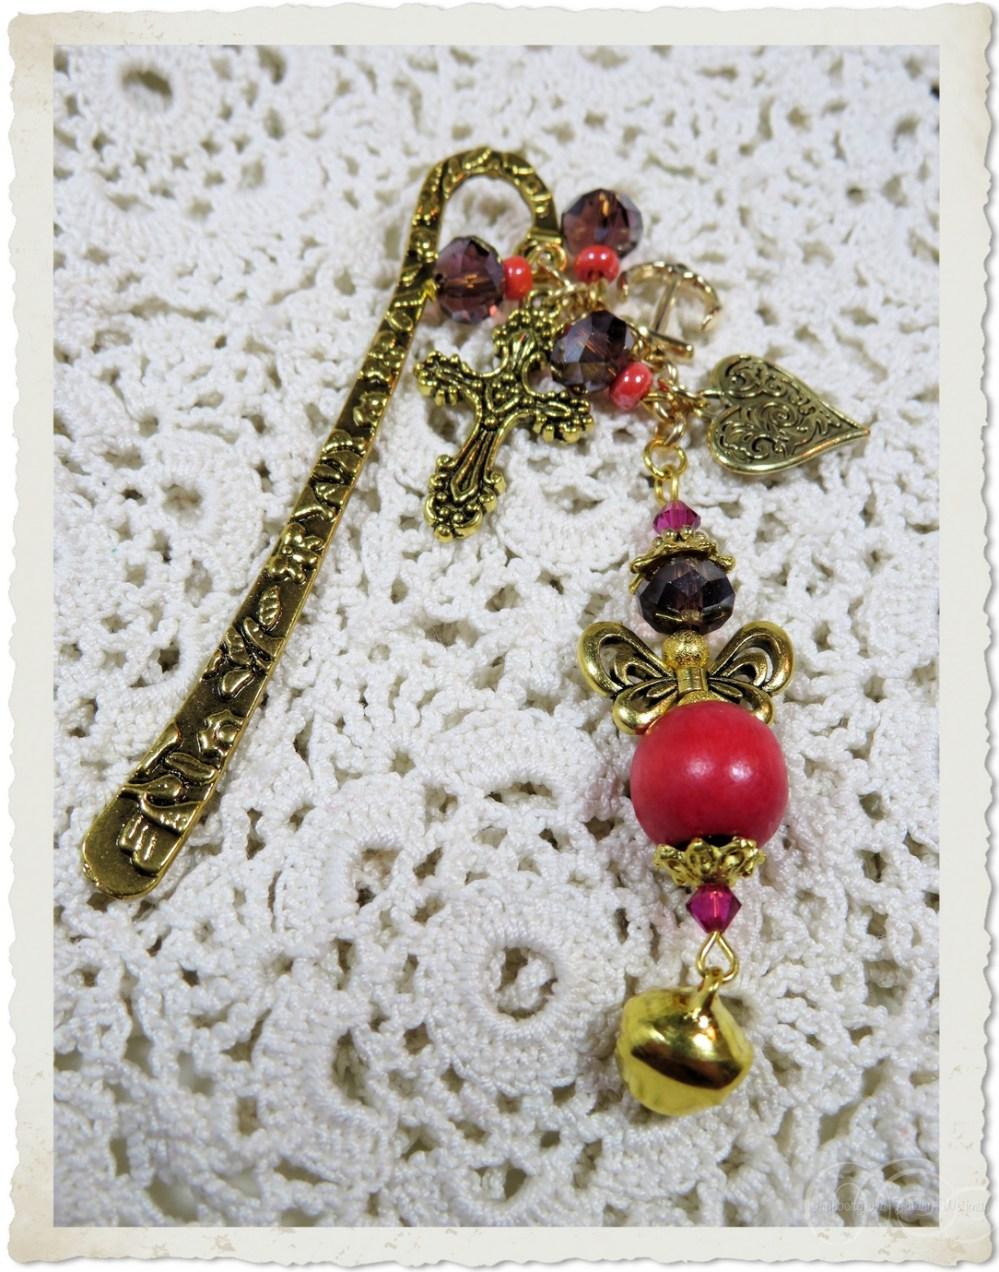 Handmade beaded bookmark with angel and prayer charms by Ingeborg van Zuiden